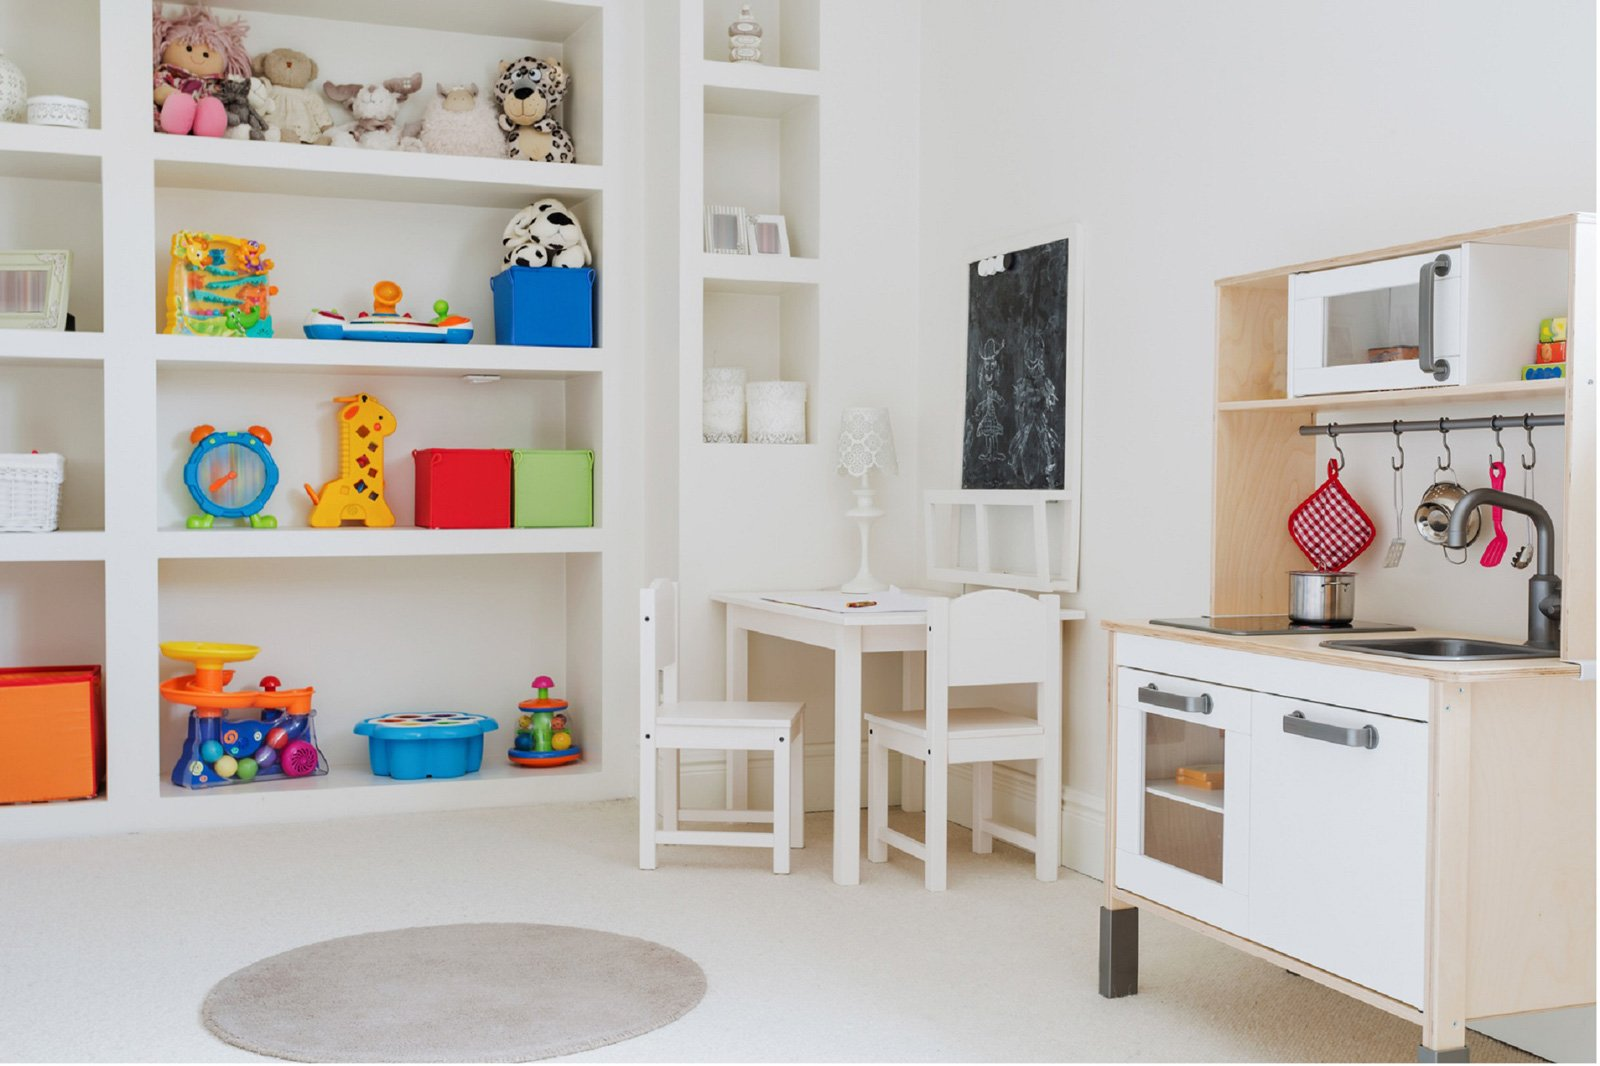 Vernice per mobili cucina finest promo web rinnovare pareti with vernice per mobili cucina - Vernice lavabile cucina ...